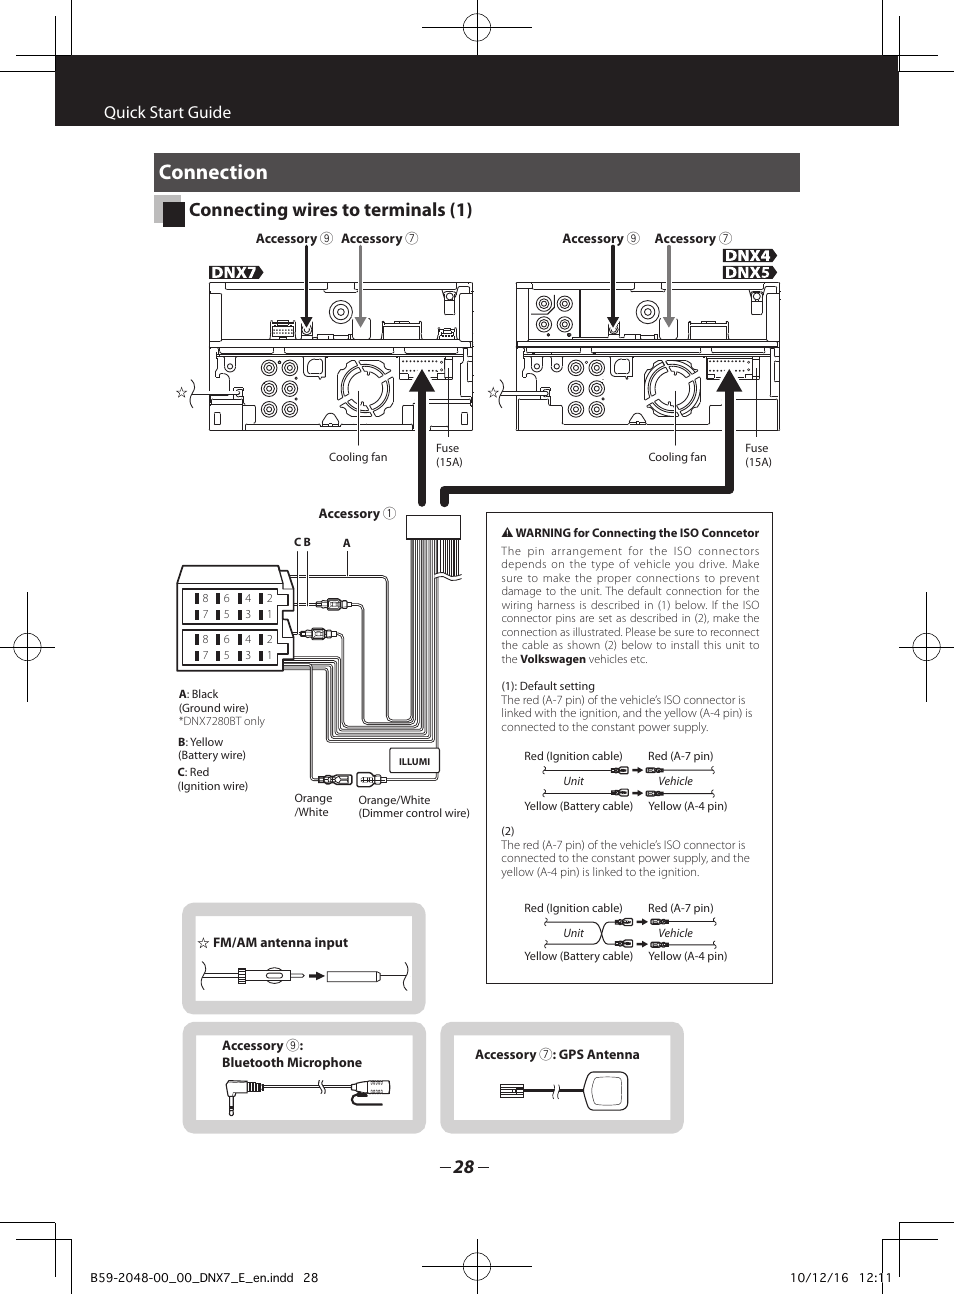 kenwood kdc mp342u wiring diagram 2007 ford f150 trailer bt558u - imageresizertool.com